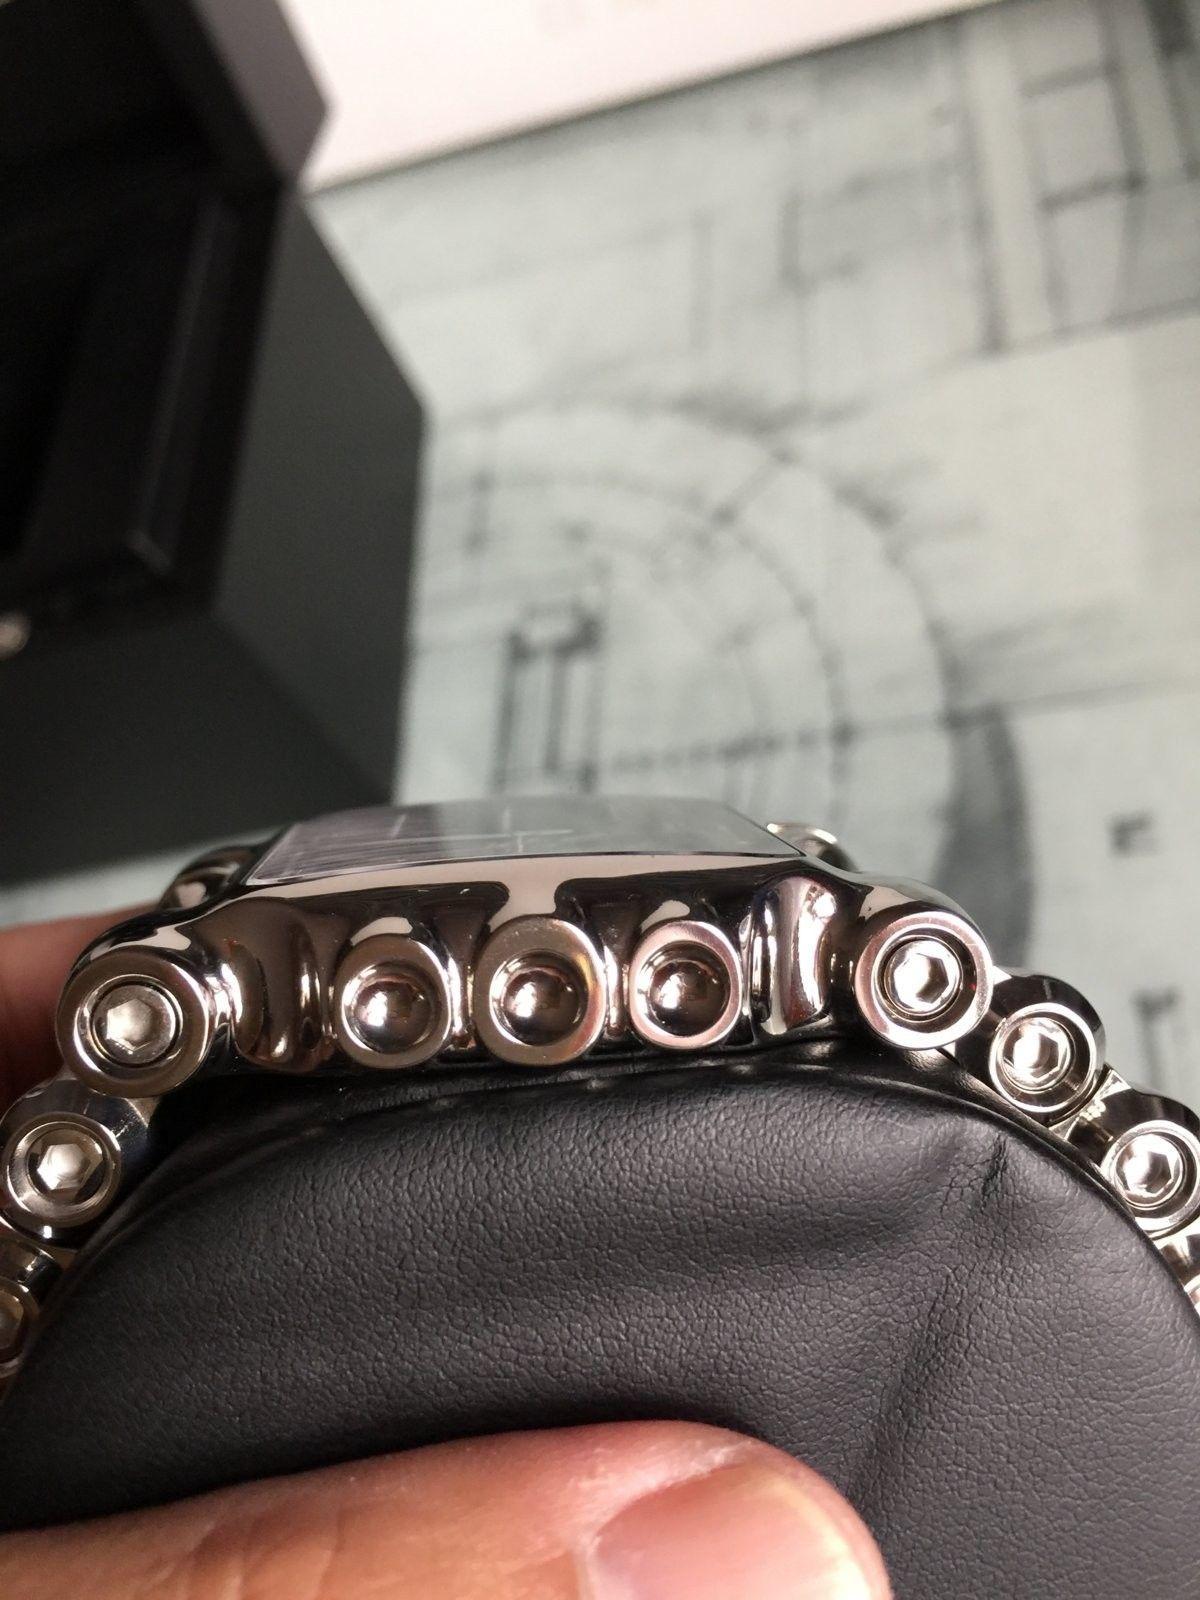 LNIB Polished Black Dial Minute Machine watch - IMG_6077.JPG